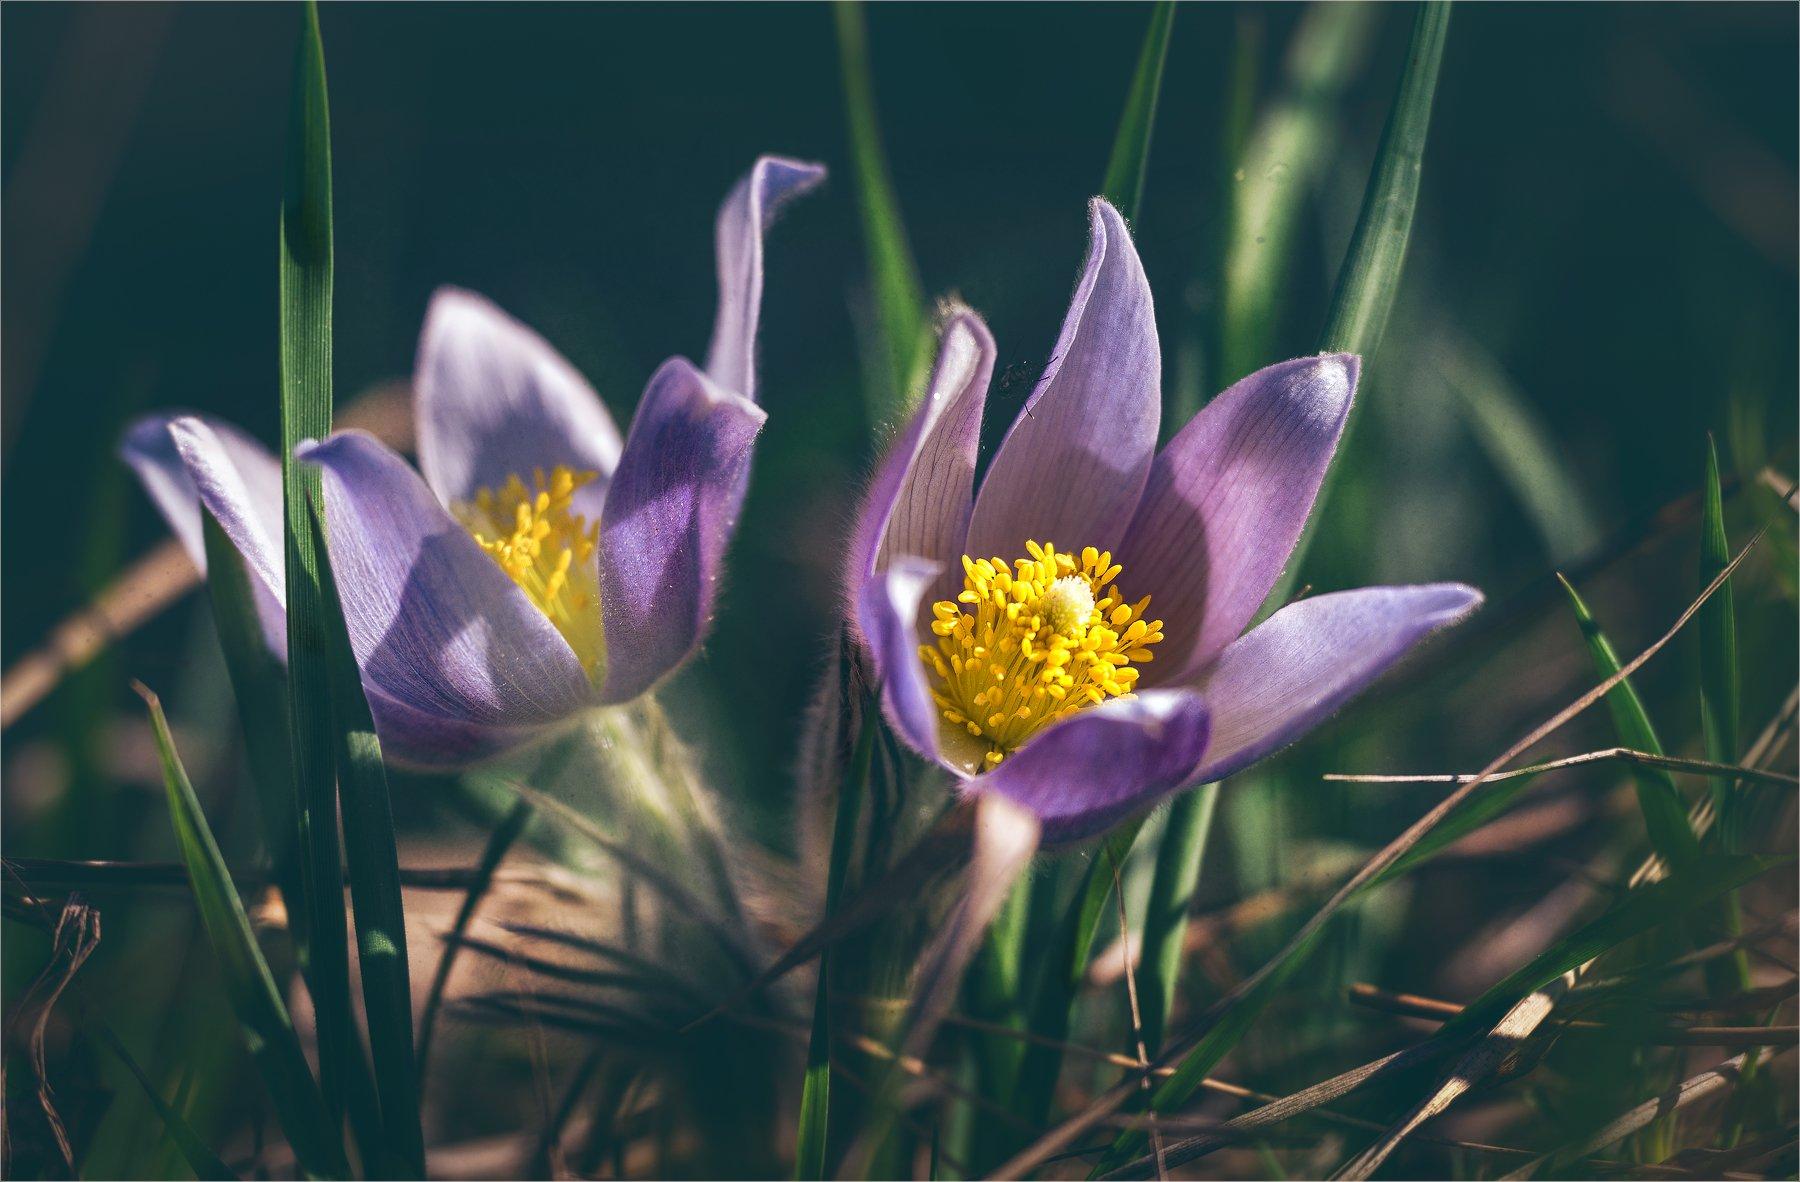 nature, природа,  растение,  солнечный свет, цветы, цветок, макро, цвести,  весна, красота, сон-трава, весна, Михаил MSH